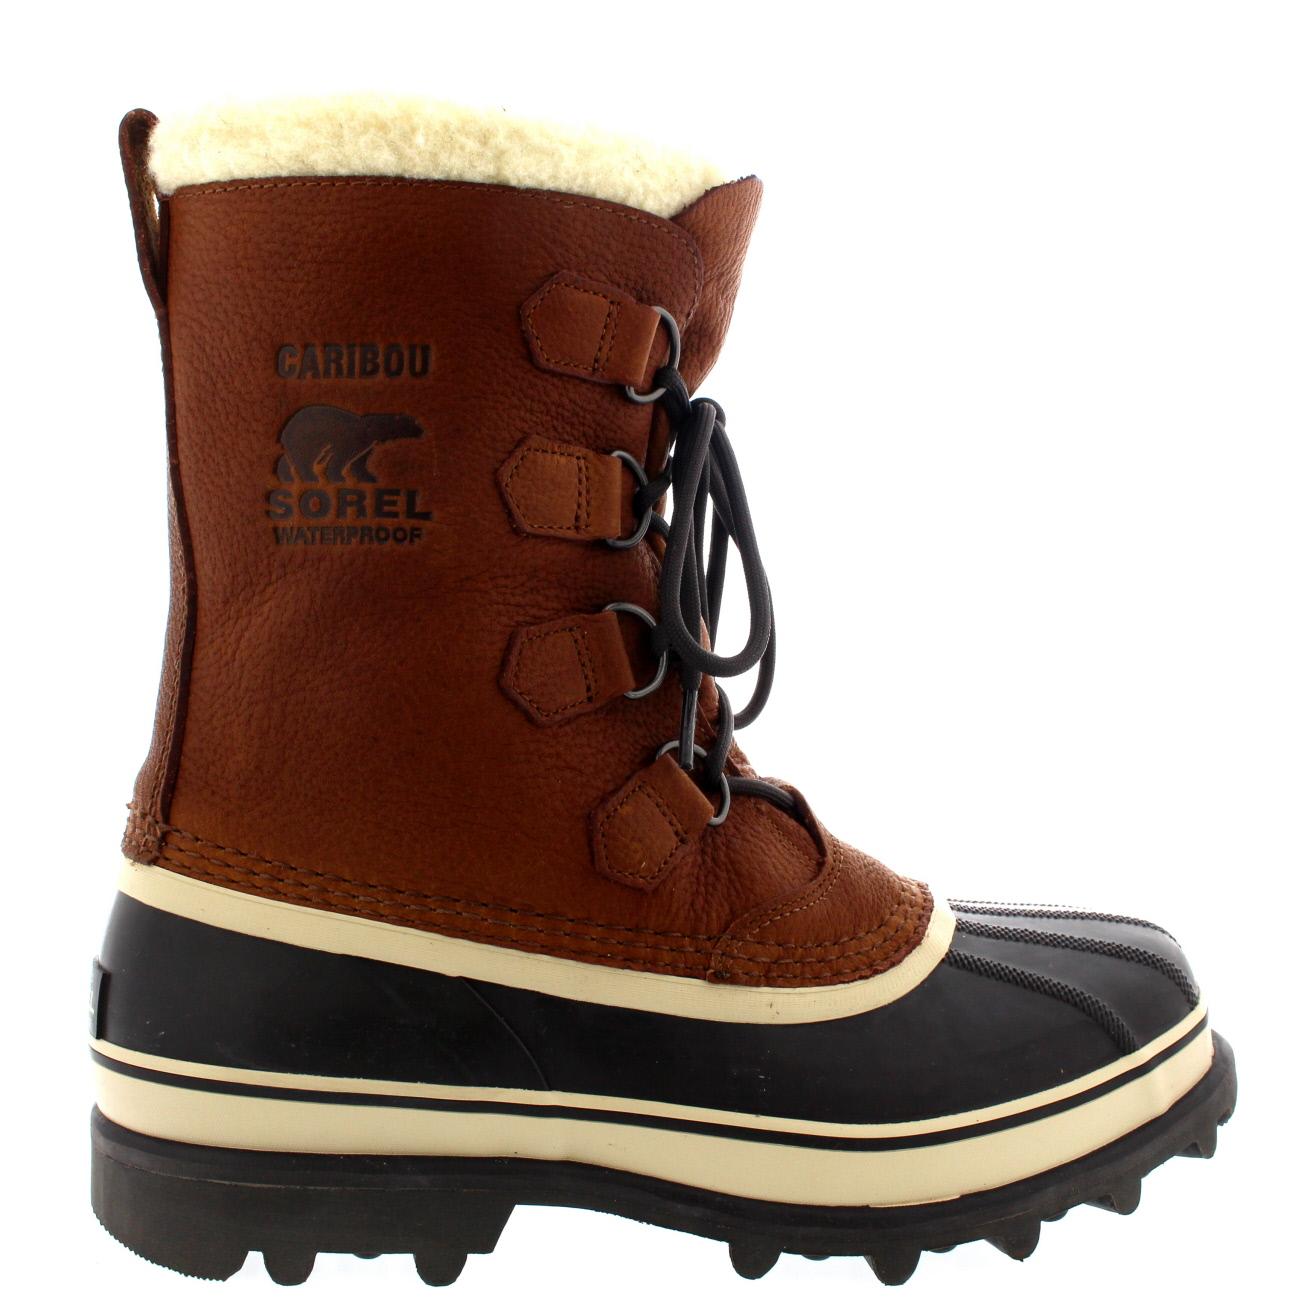 sorel mens snow boots uk mount mercy